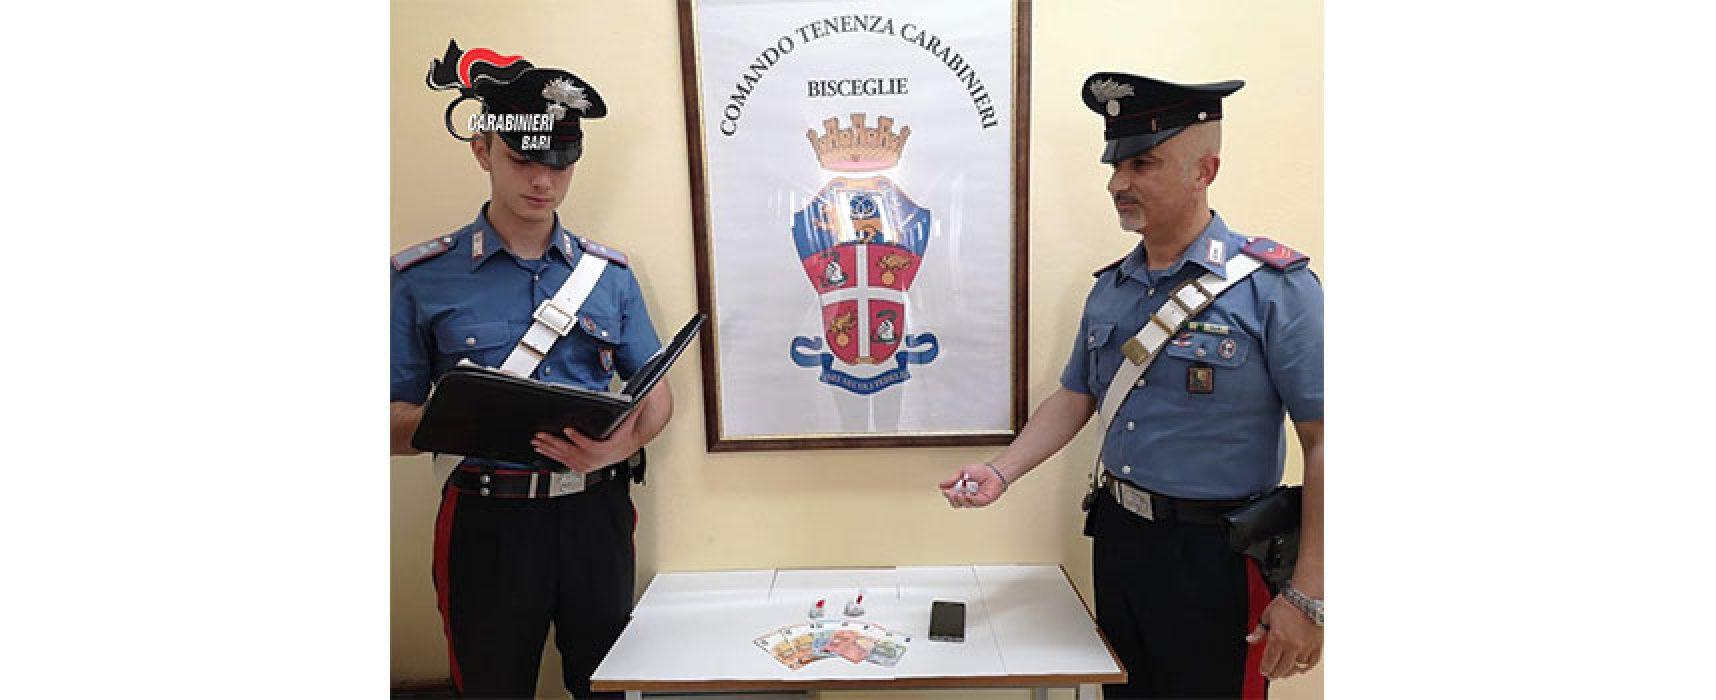 Spaccio di eroina, arrestata 49enne biscegliese